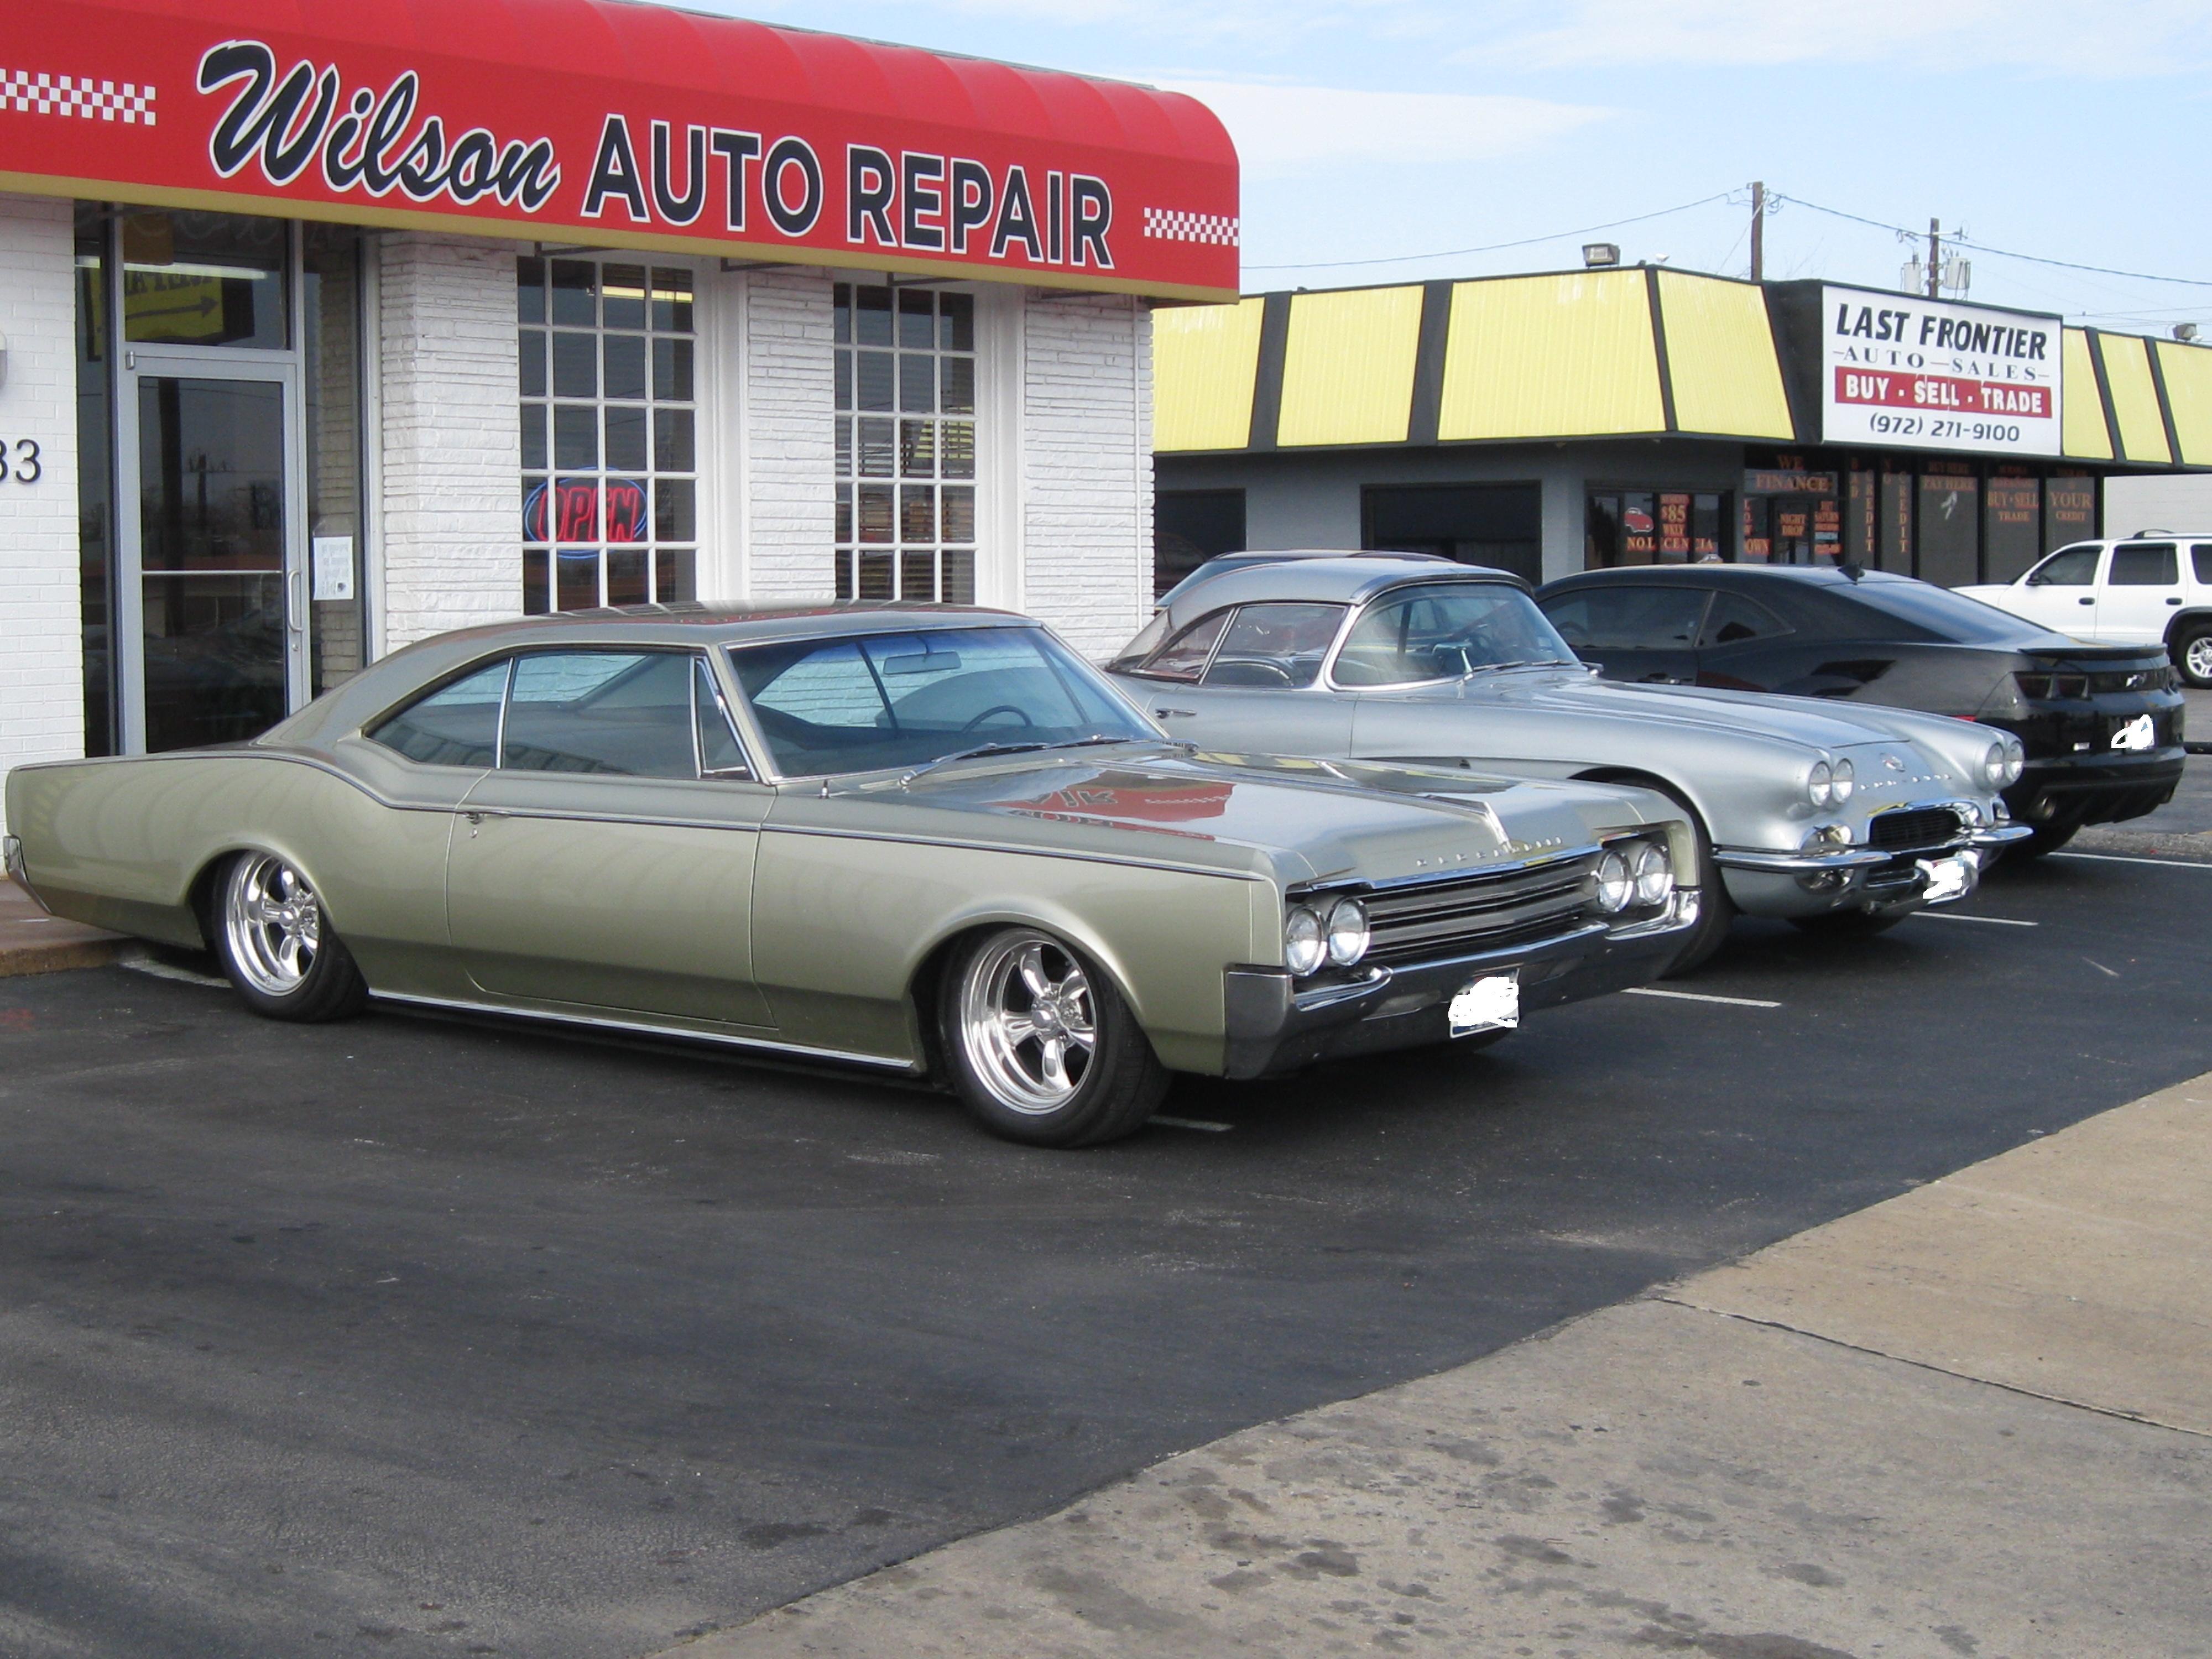 Cool Cars Wilsons Auto Restoration Blog Wilsons Auto - We love cool cars